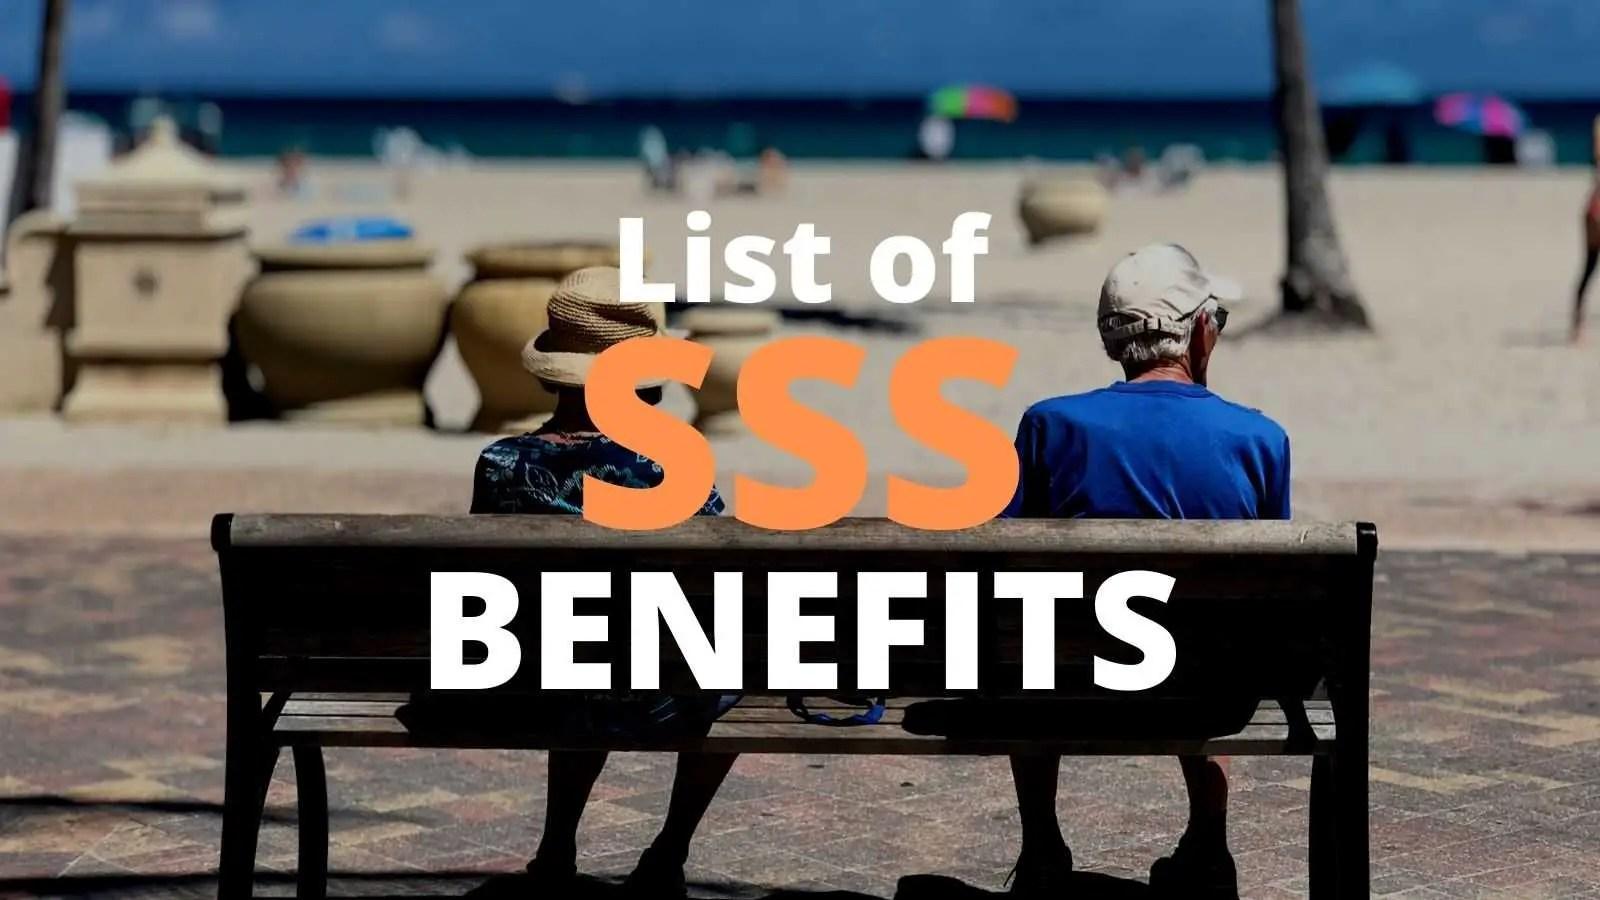 sss benefits 2021